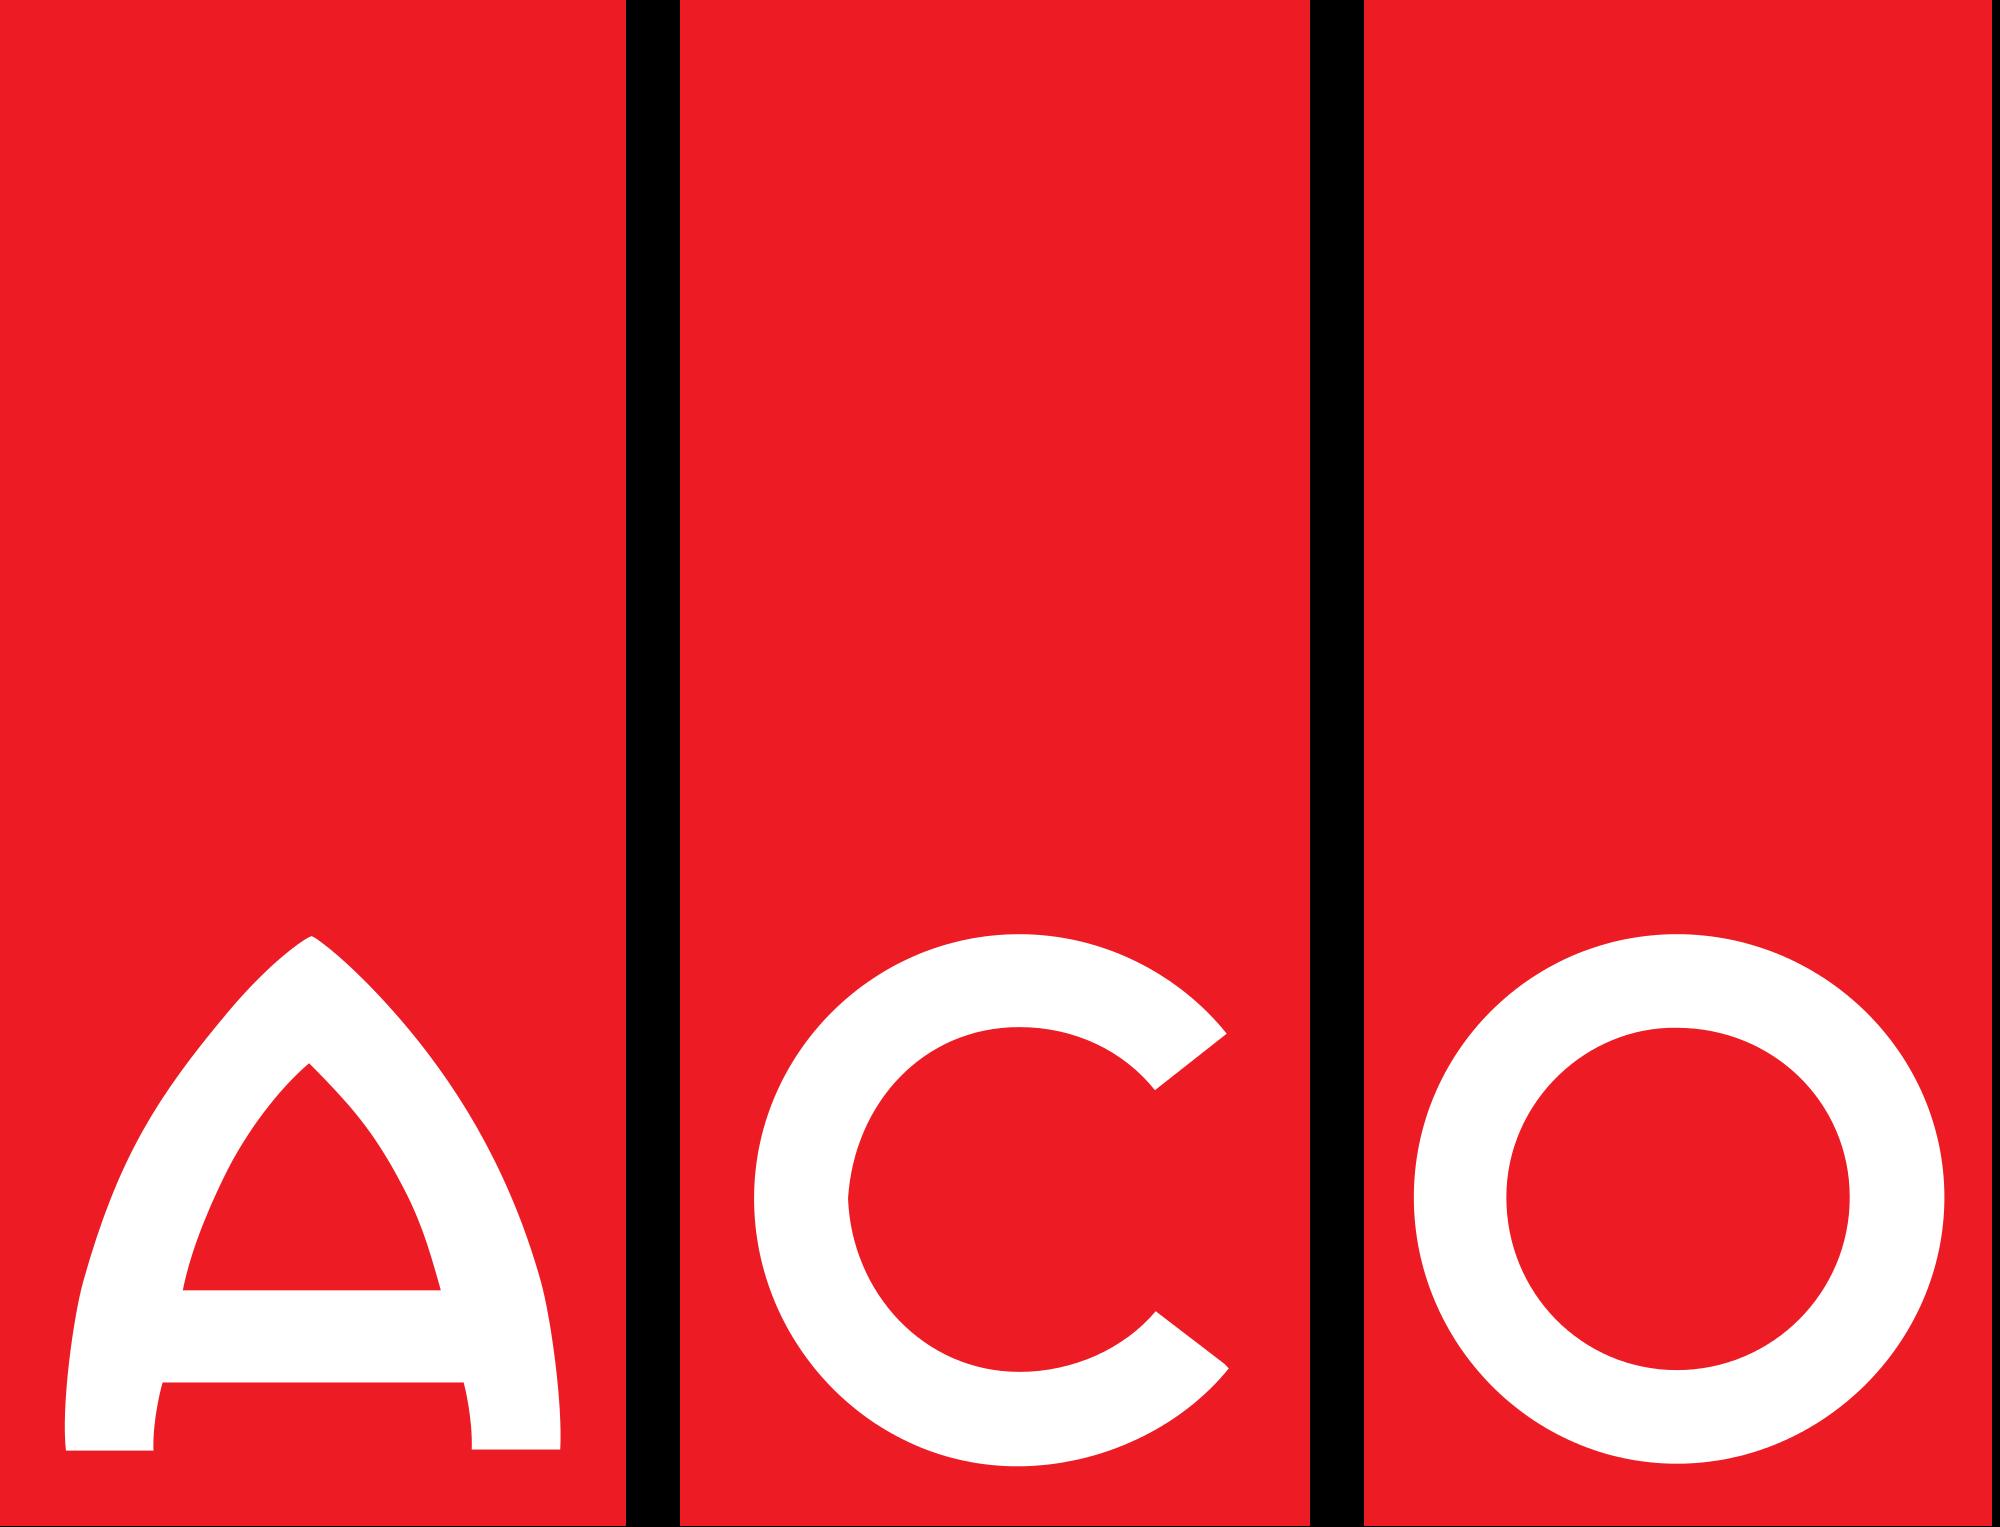 Aco Logo Bigmat Roca